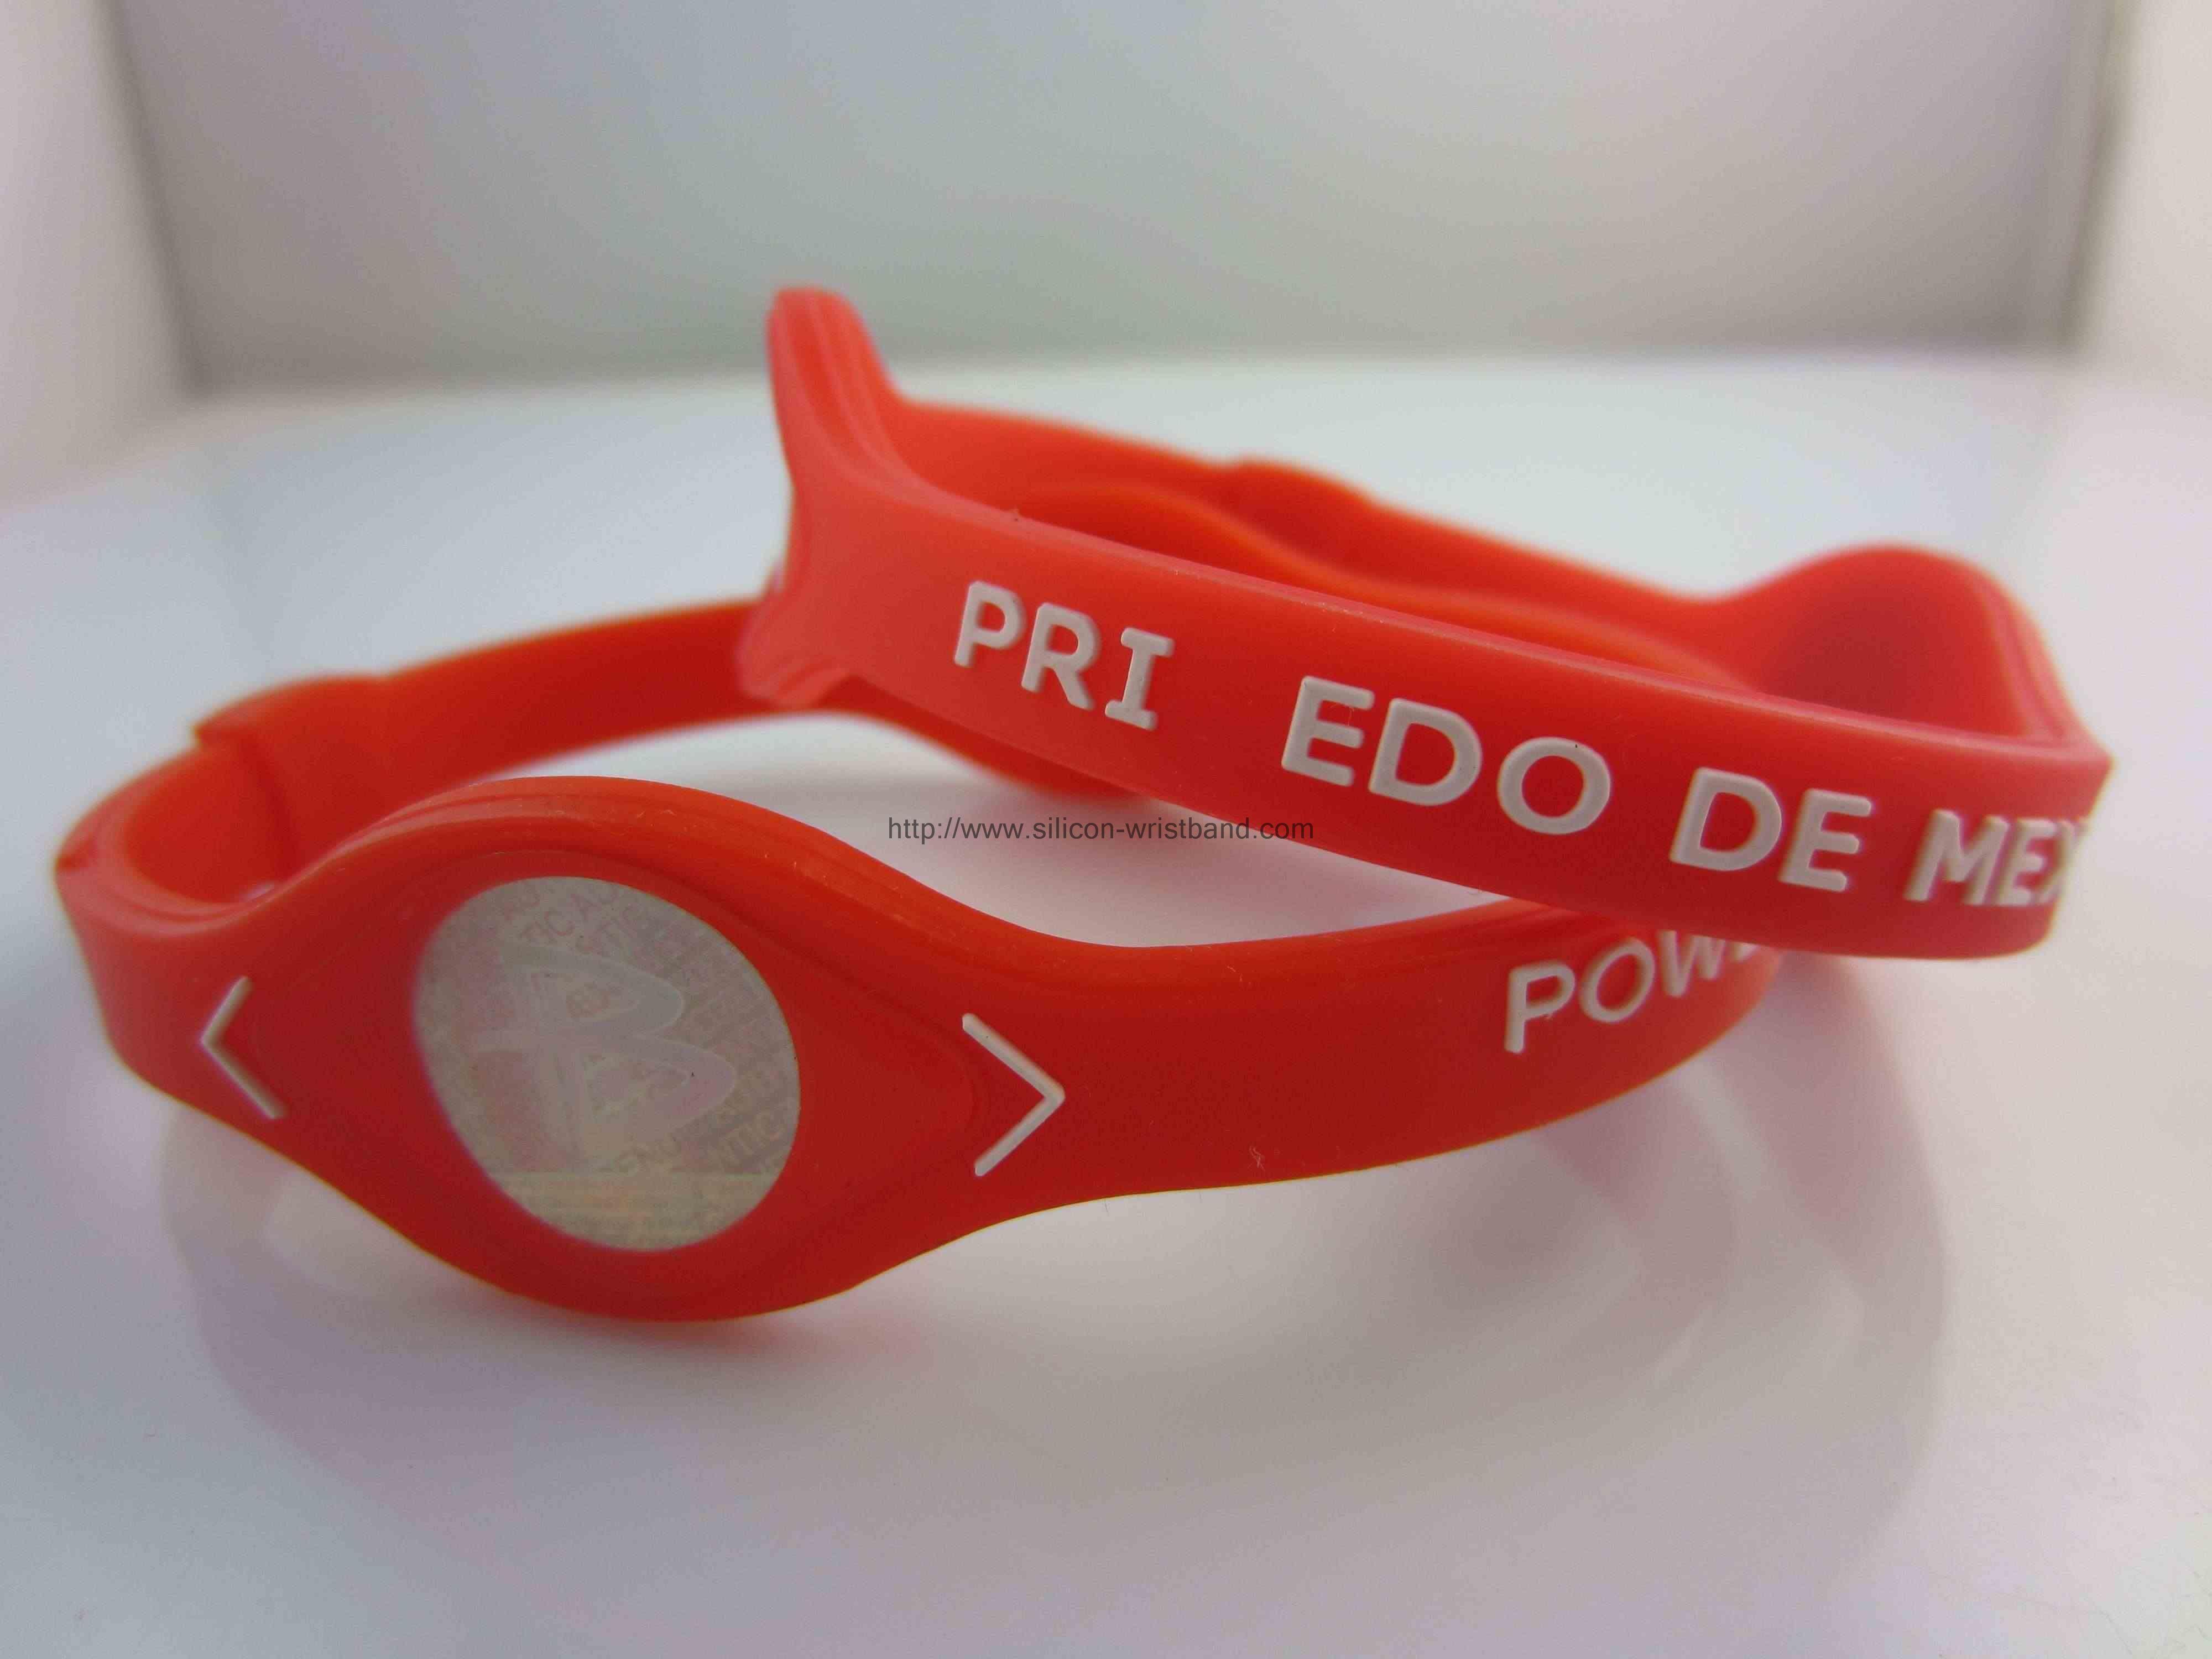 charity wristband